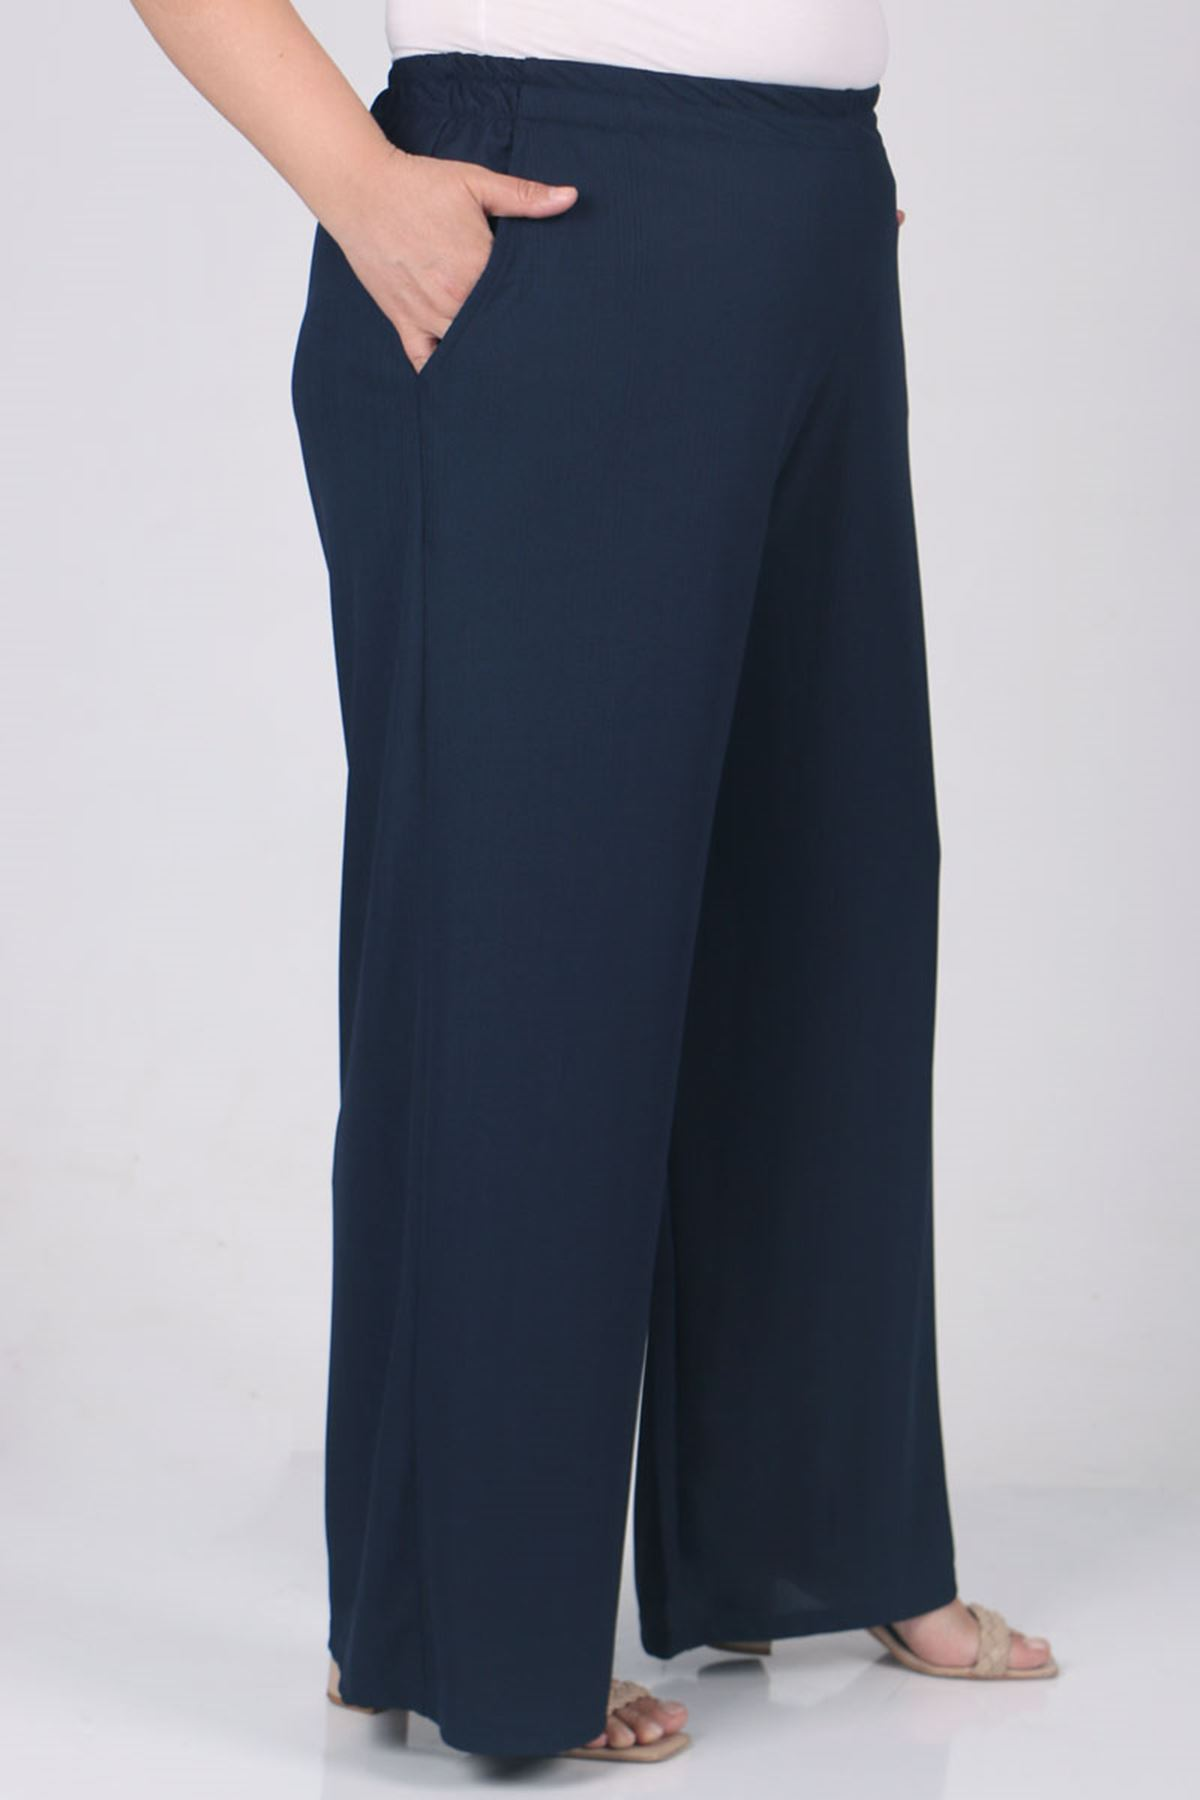 9163 Plus Size Elastic Waist Pants - Navy blue